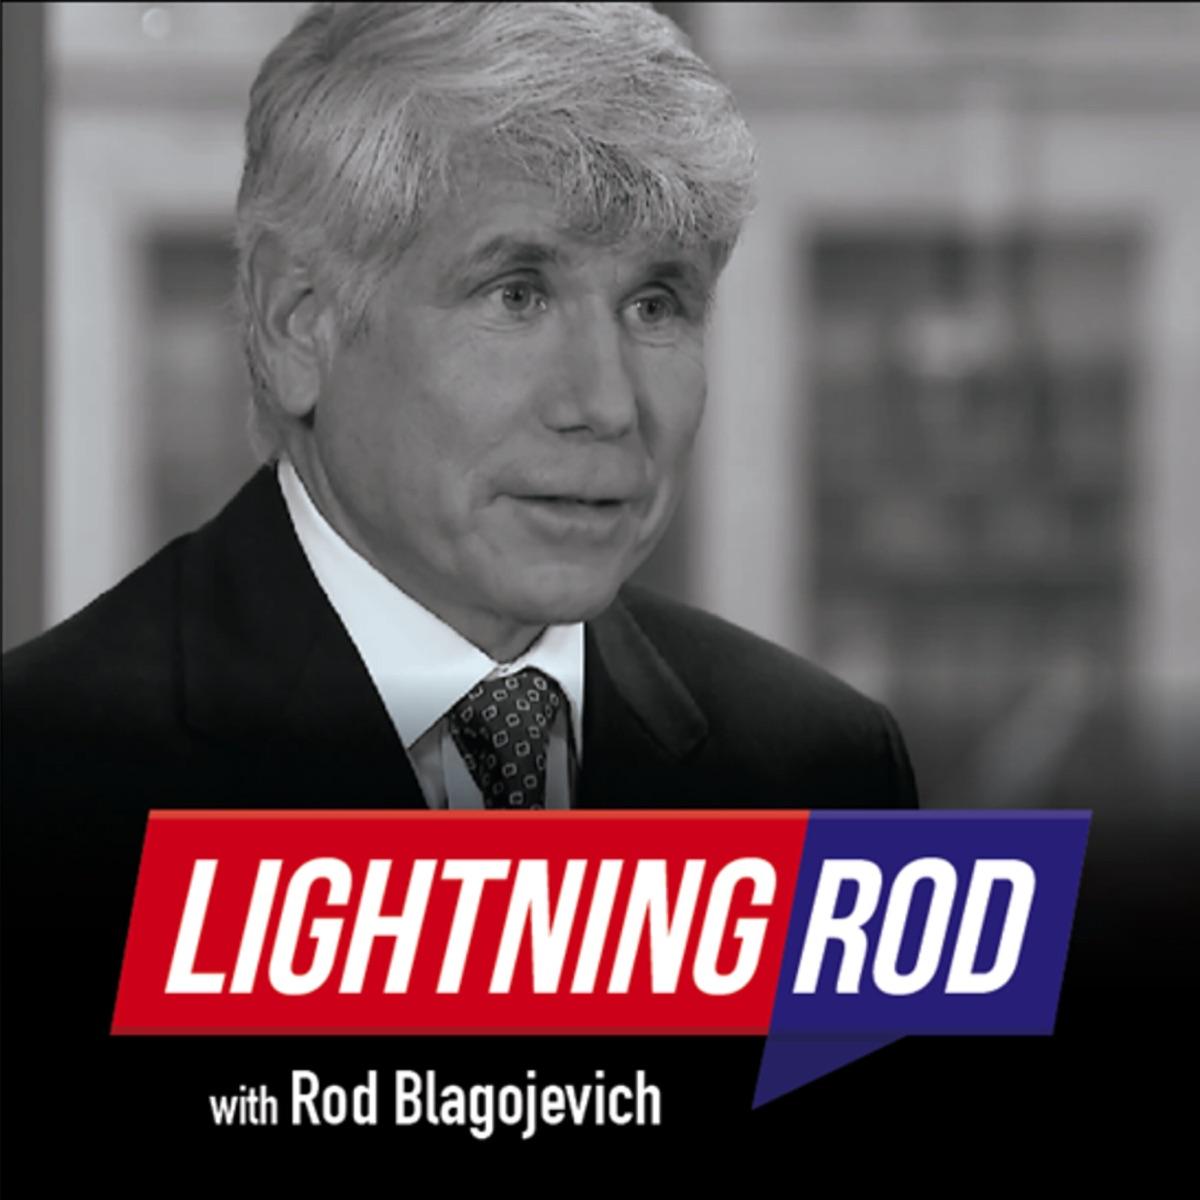 Lightning Rod with Rod Blagojevich